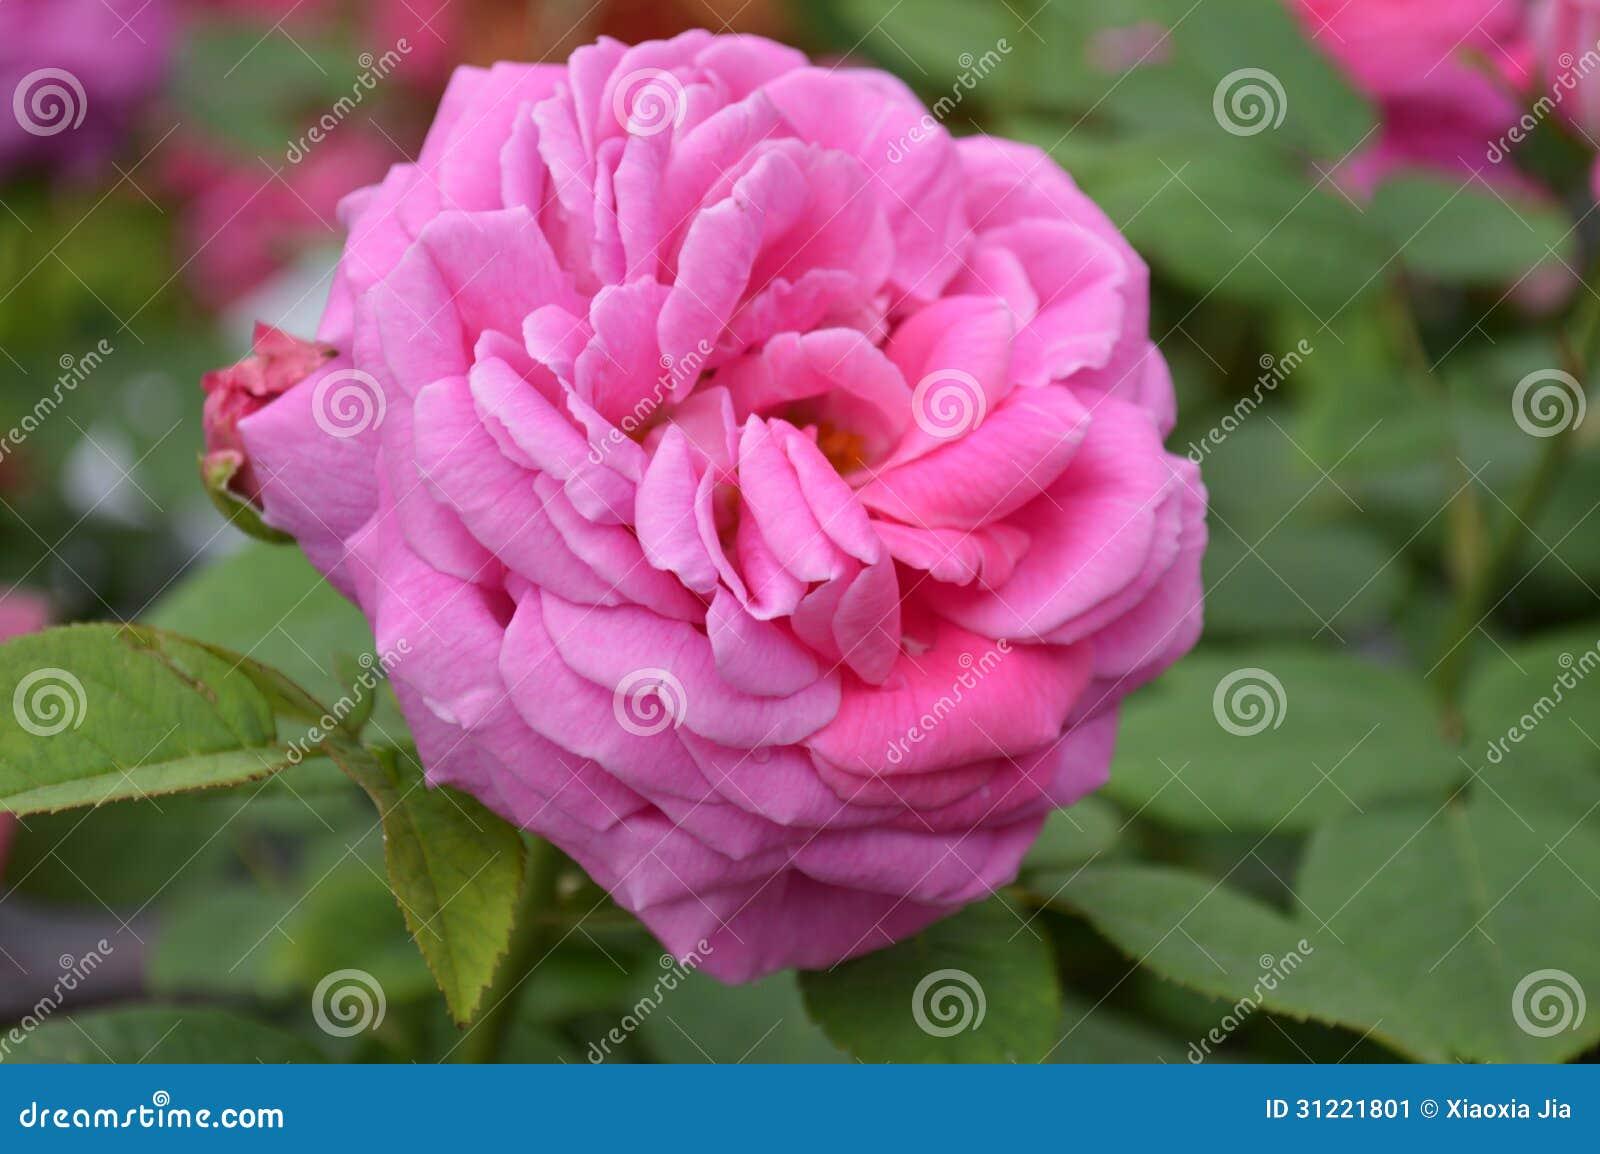 China rose flower stock image image 31221801 - Rosas chinas ...